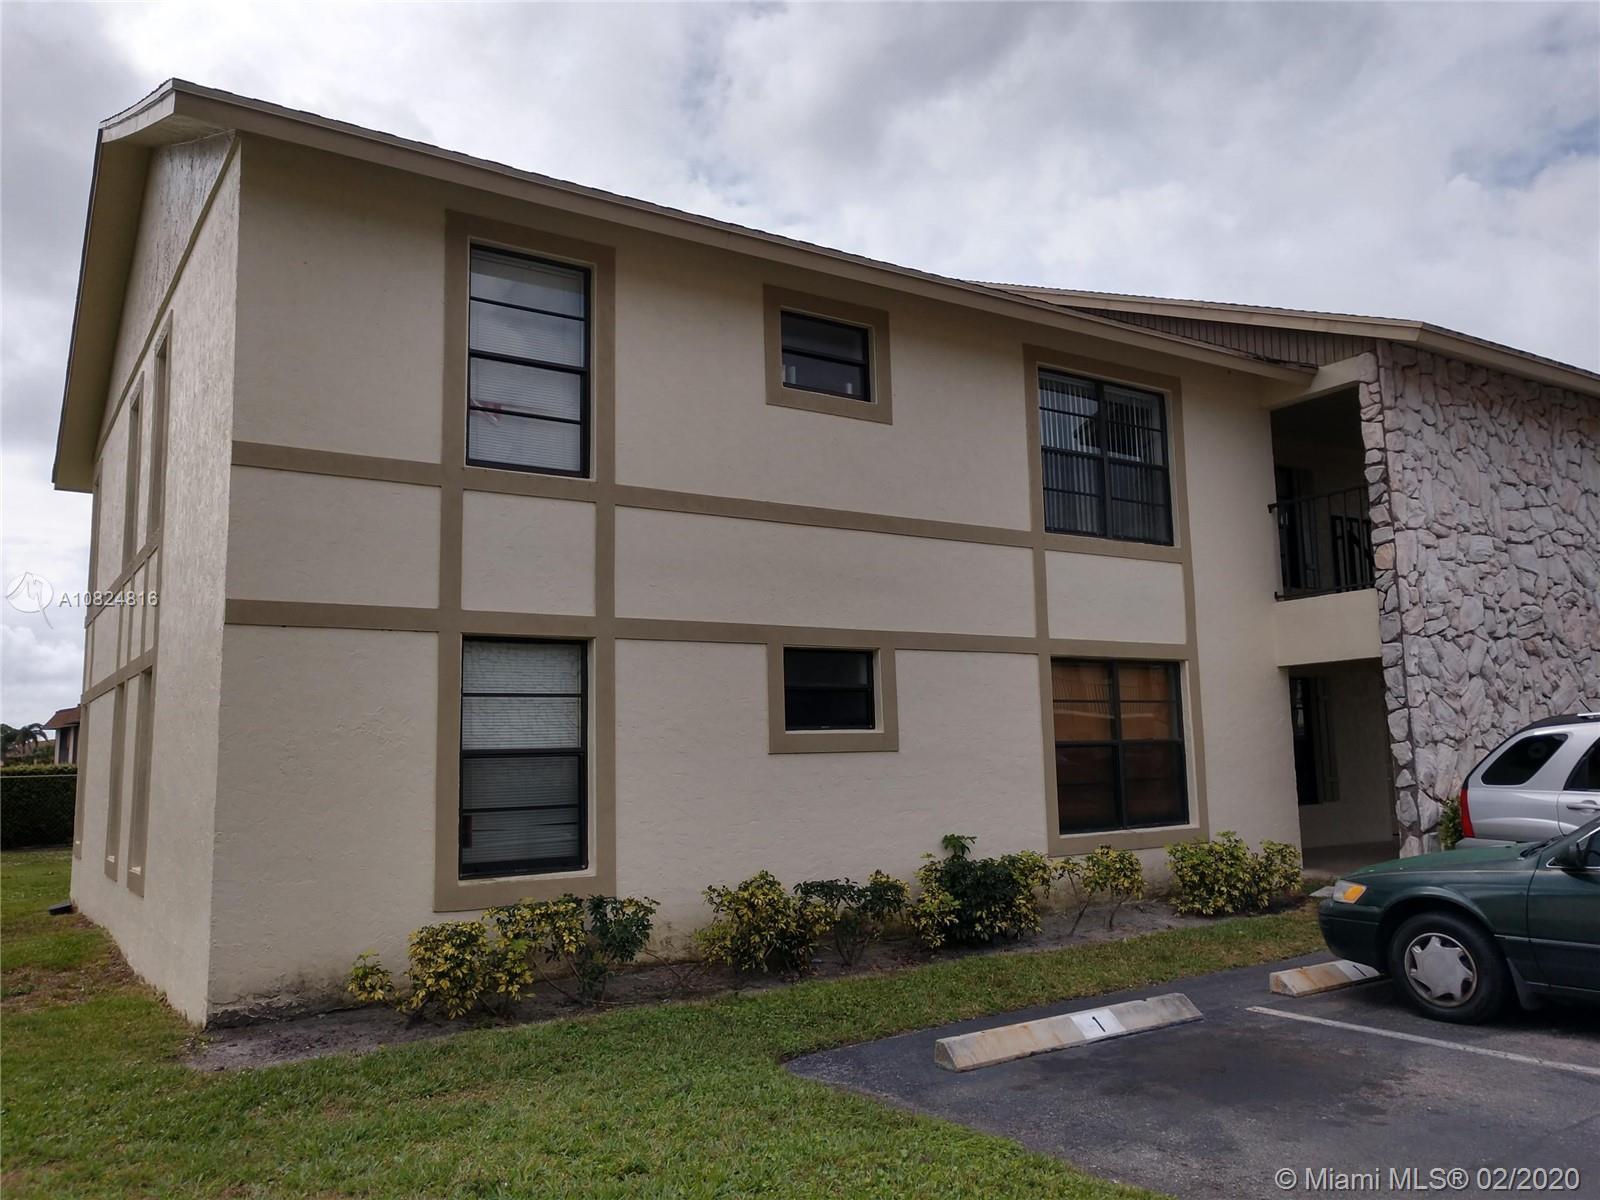 5894 Longbow Ln 4, West Palm Beach, FL 33415